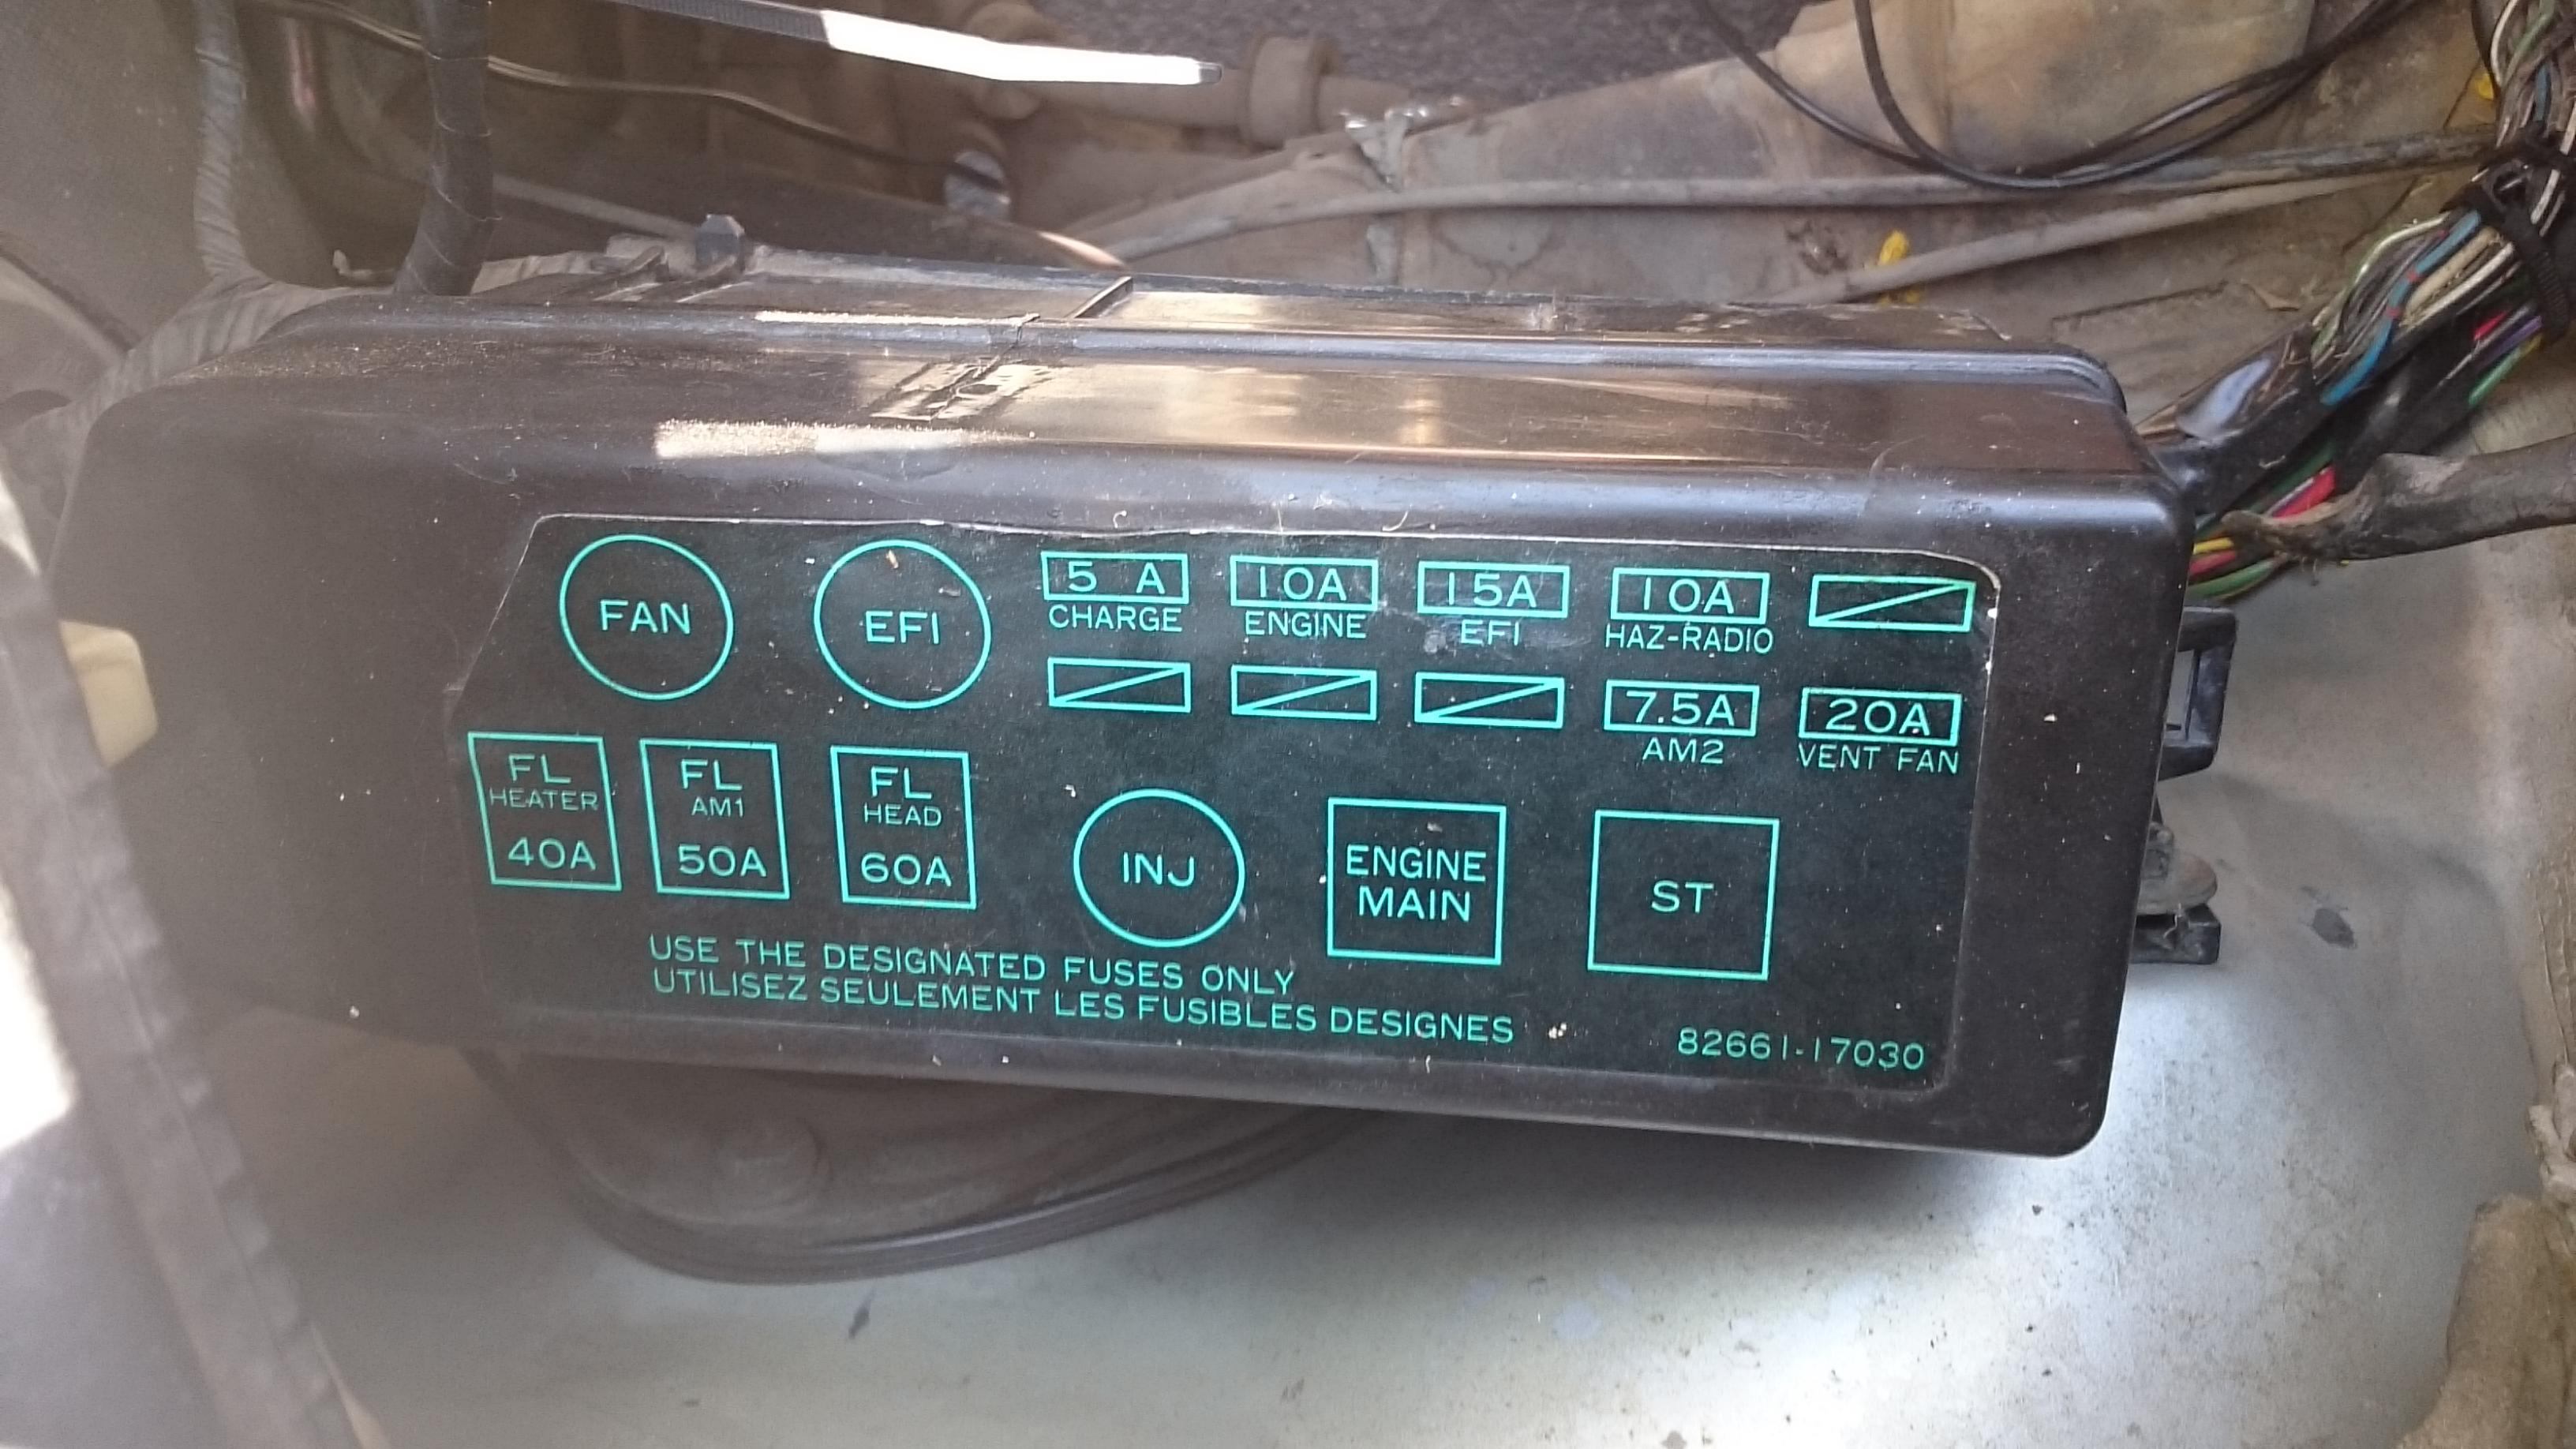 Superb 92 Toyota Mr2 Fuse Box Everything Wiring Diagram Wiring Cloud Faunaidewilluminateatxorg